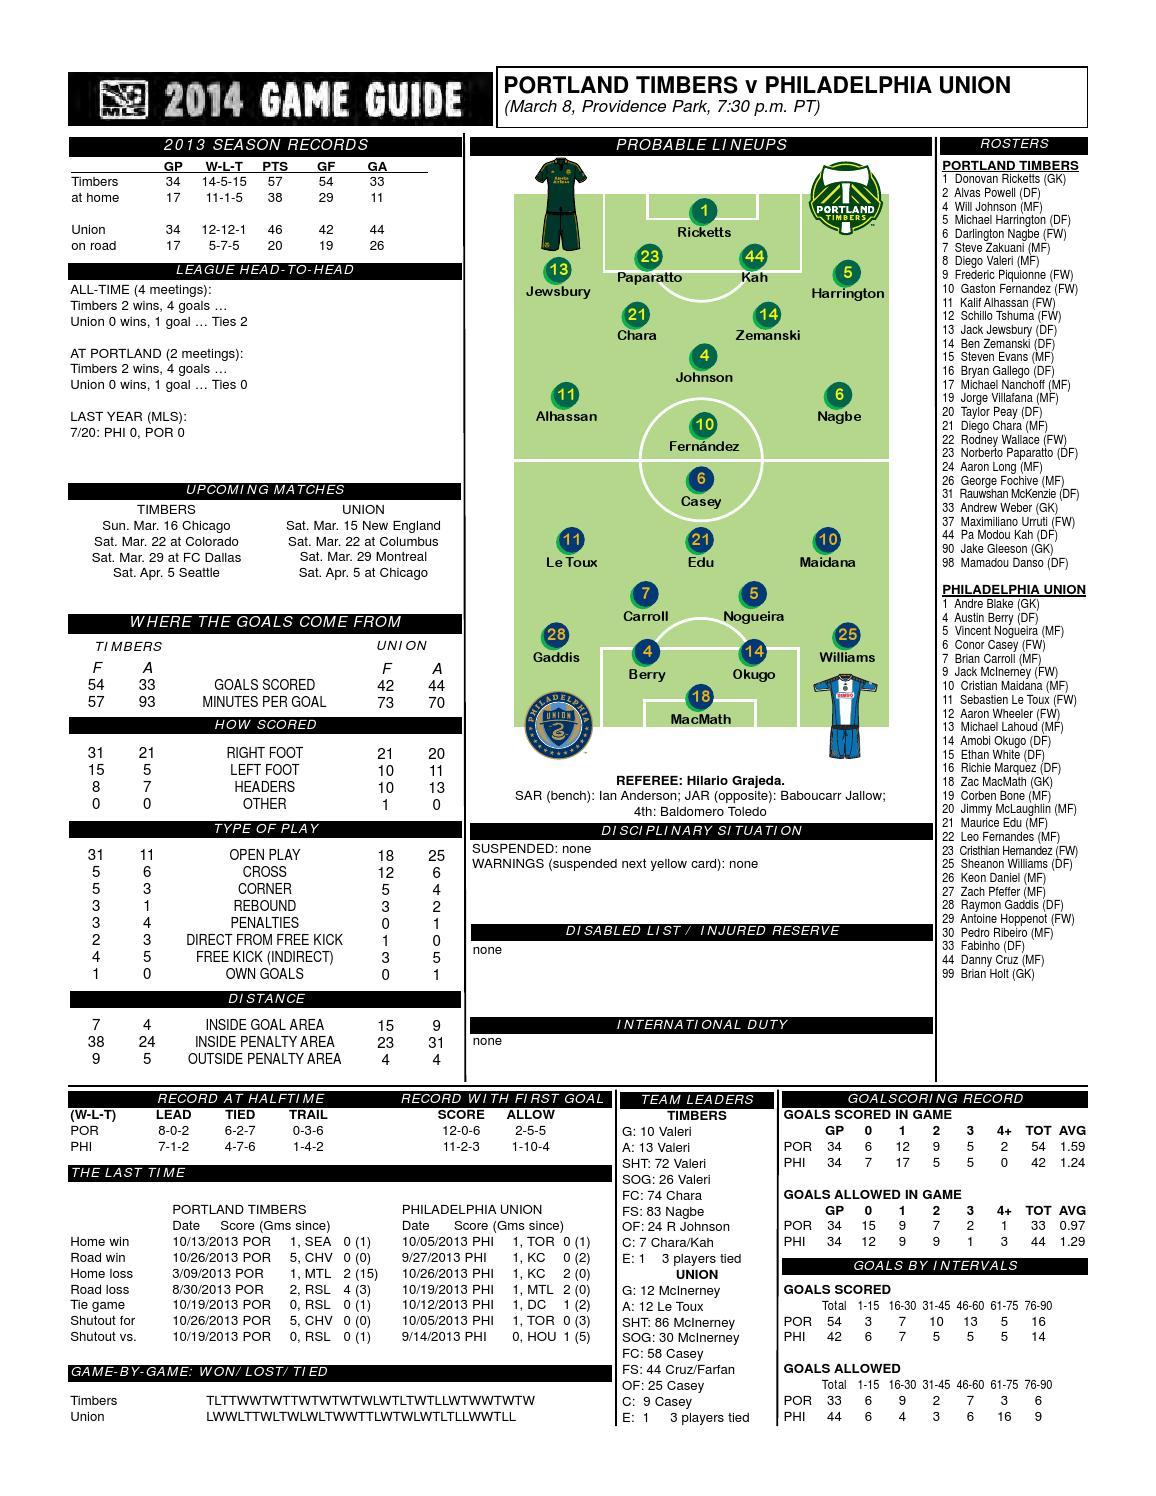 Game Guide: Portland Timbers vs. Philadelphia Union Mar. 3